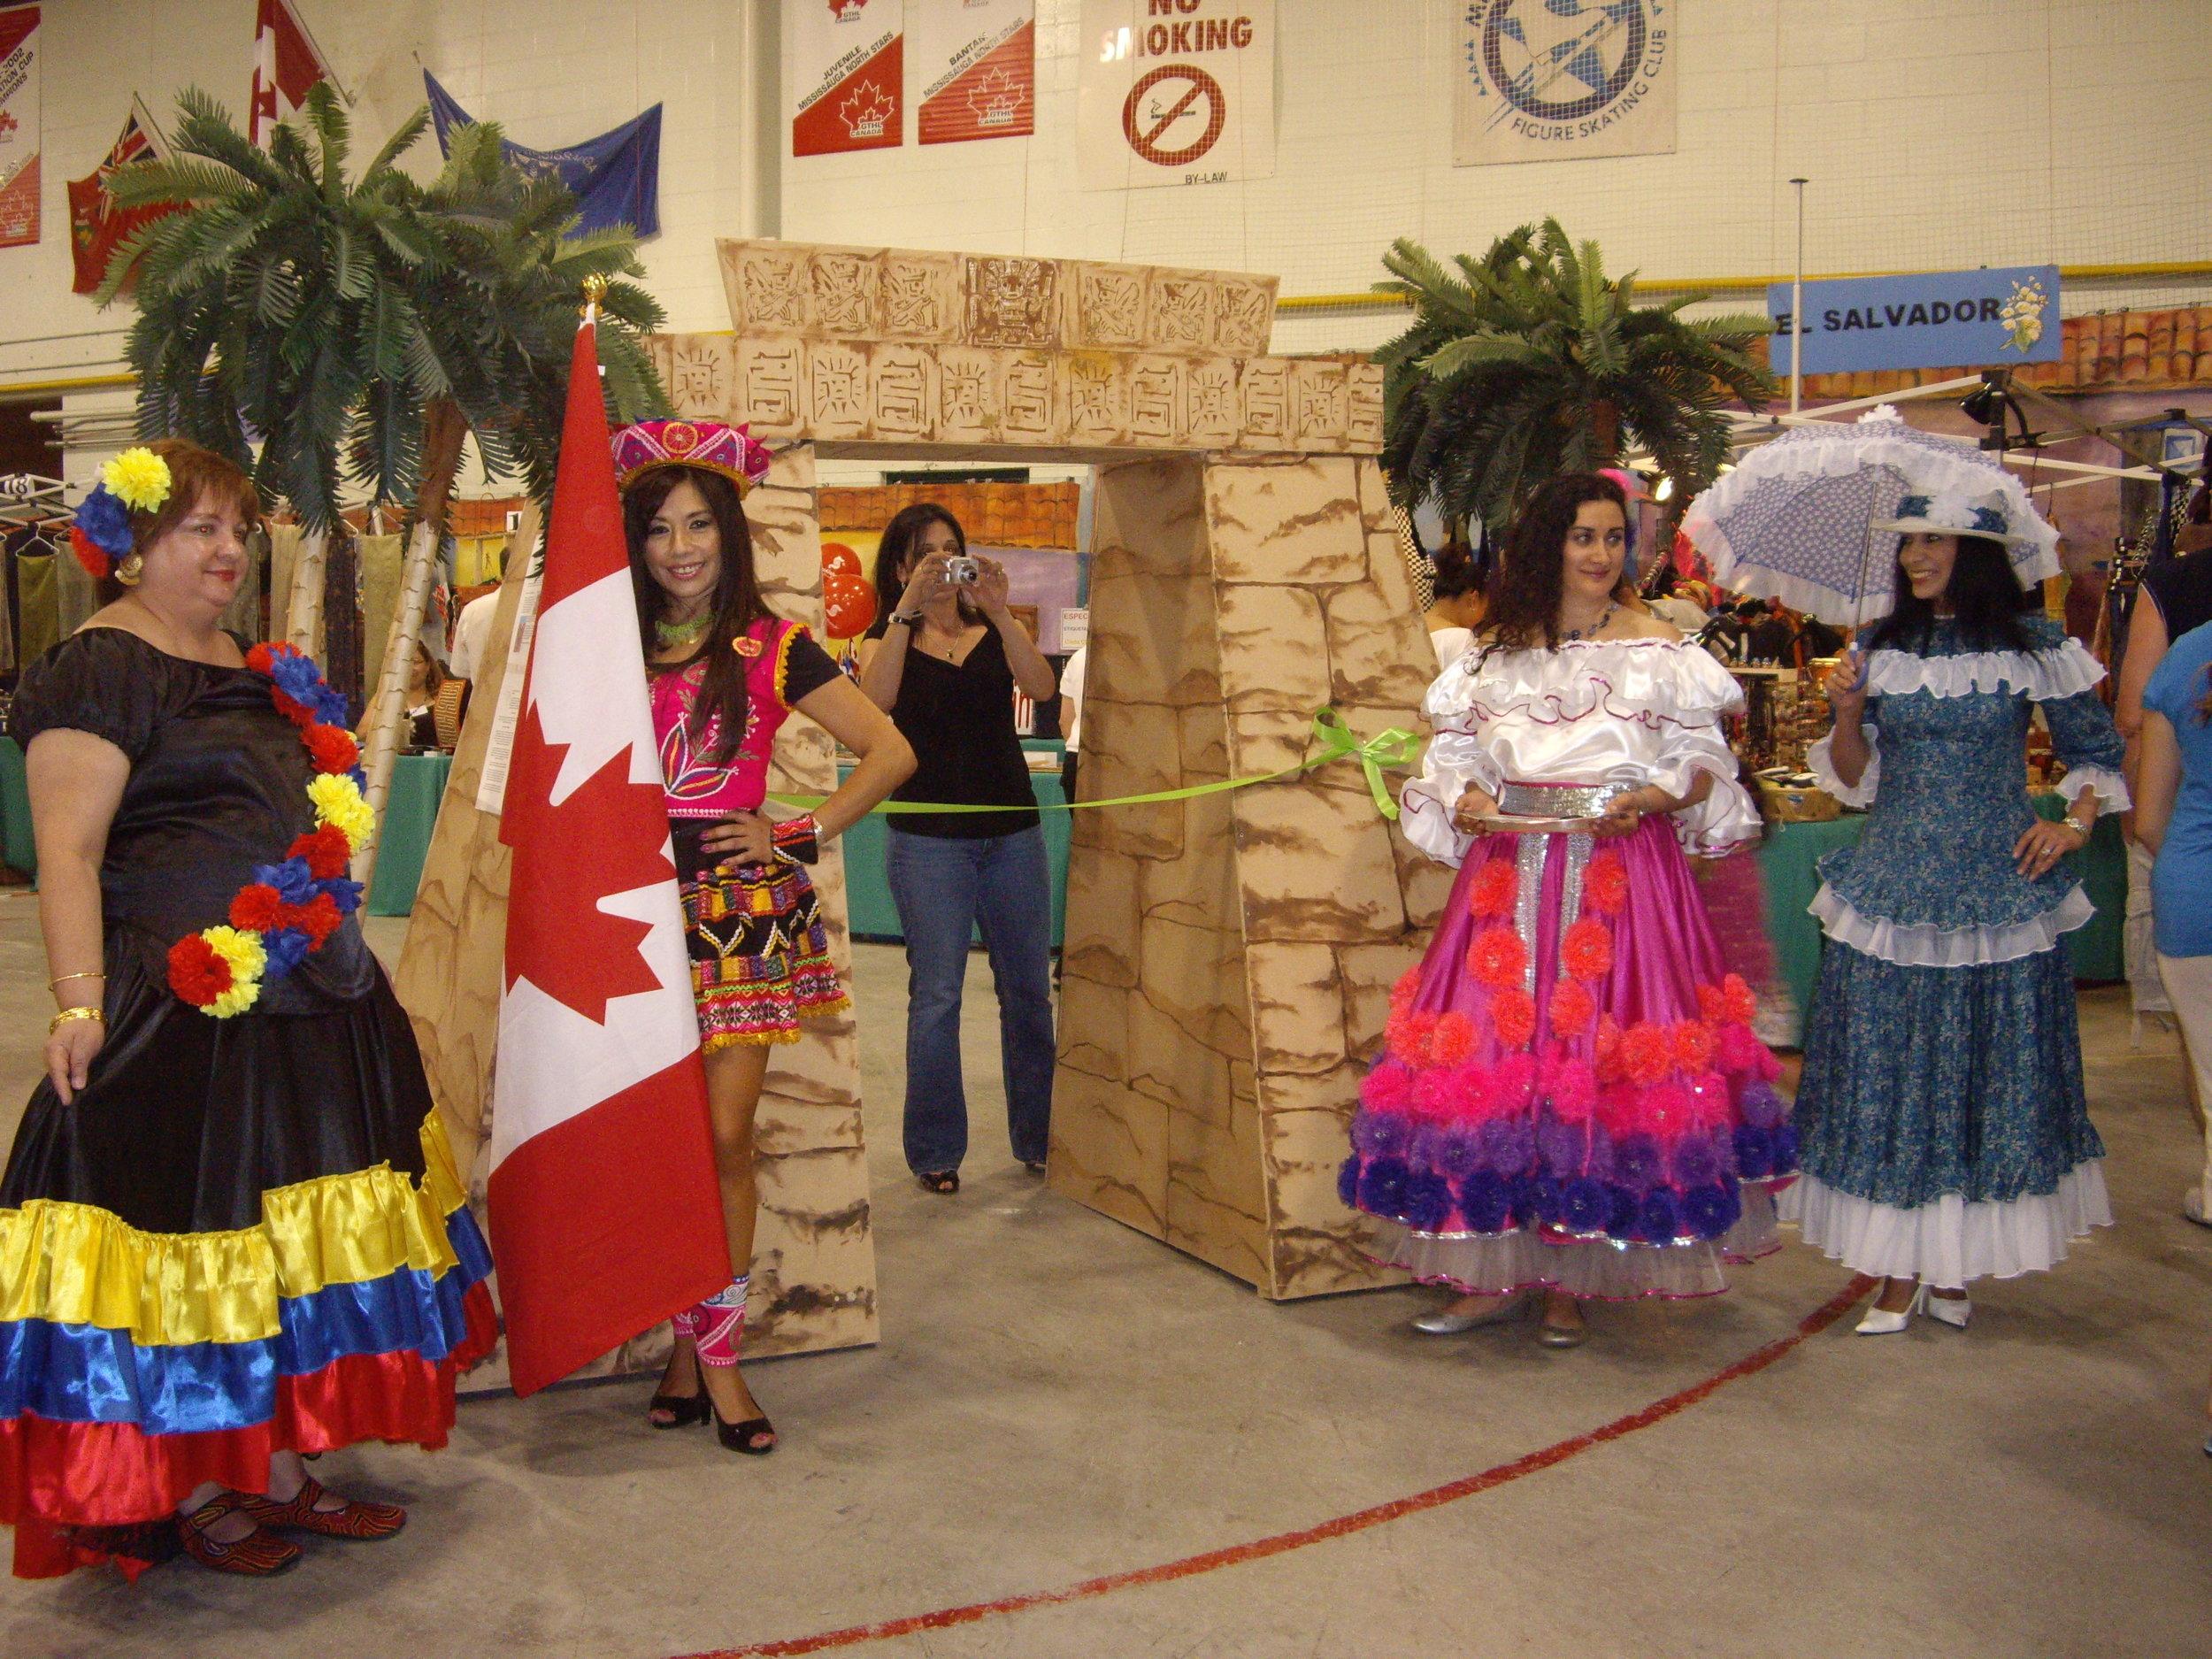 Opening Ceremonies, Latin American Pavilion 2012